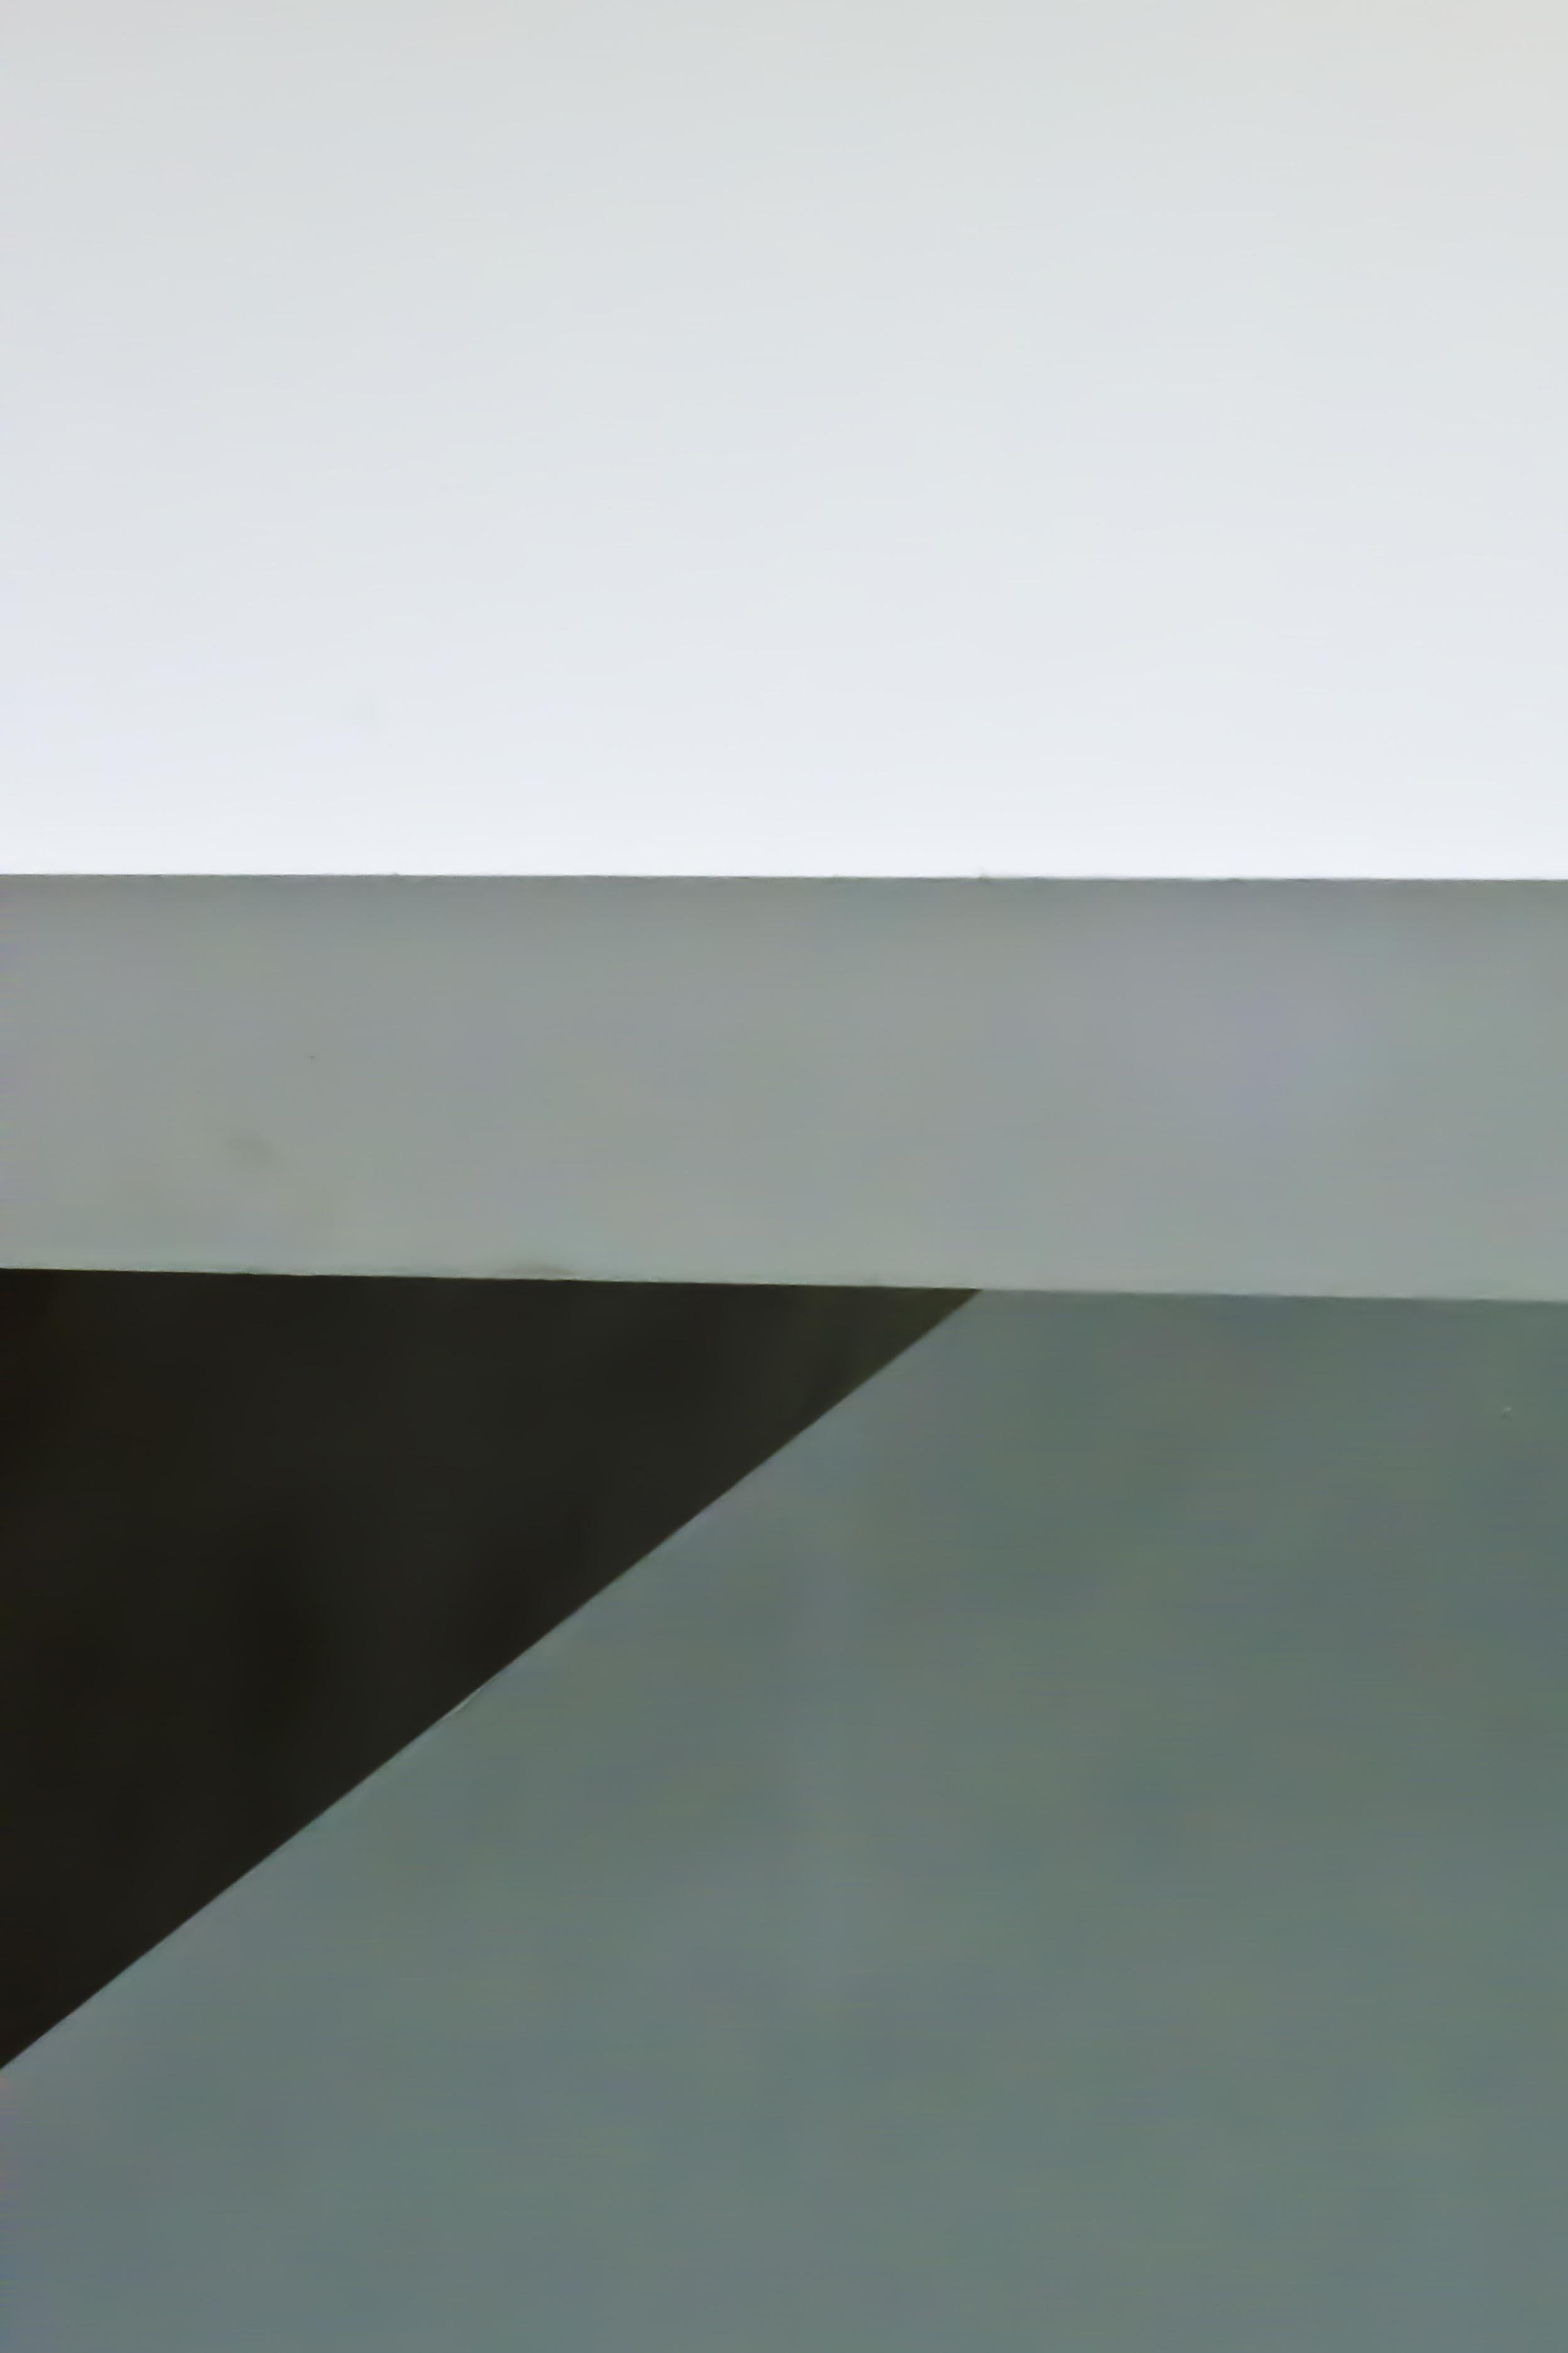 Lines #141 (26/10/12)